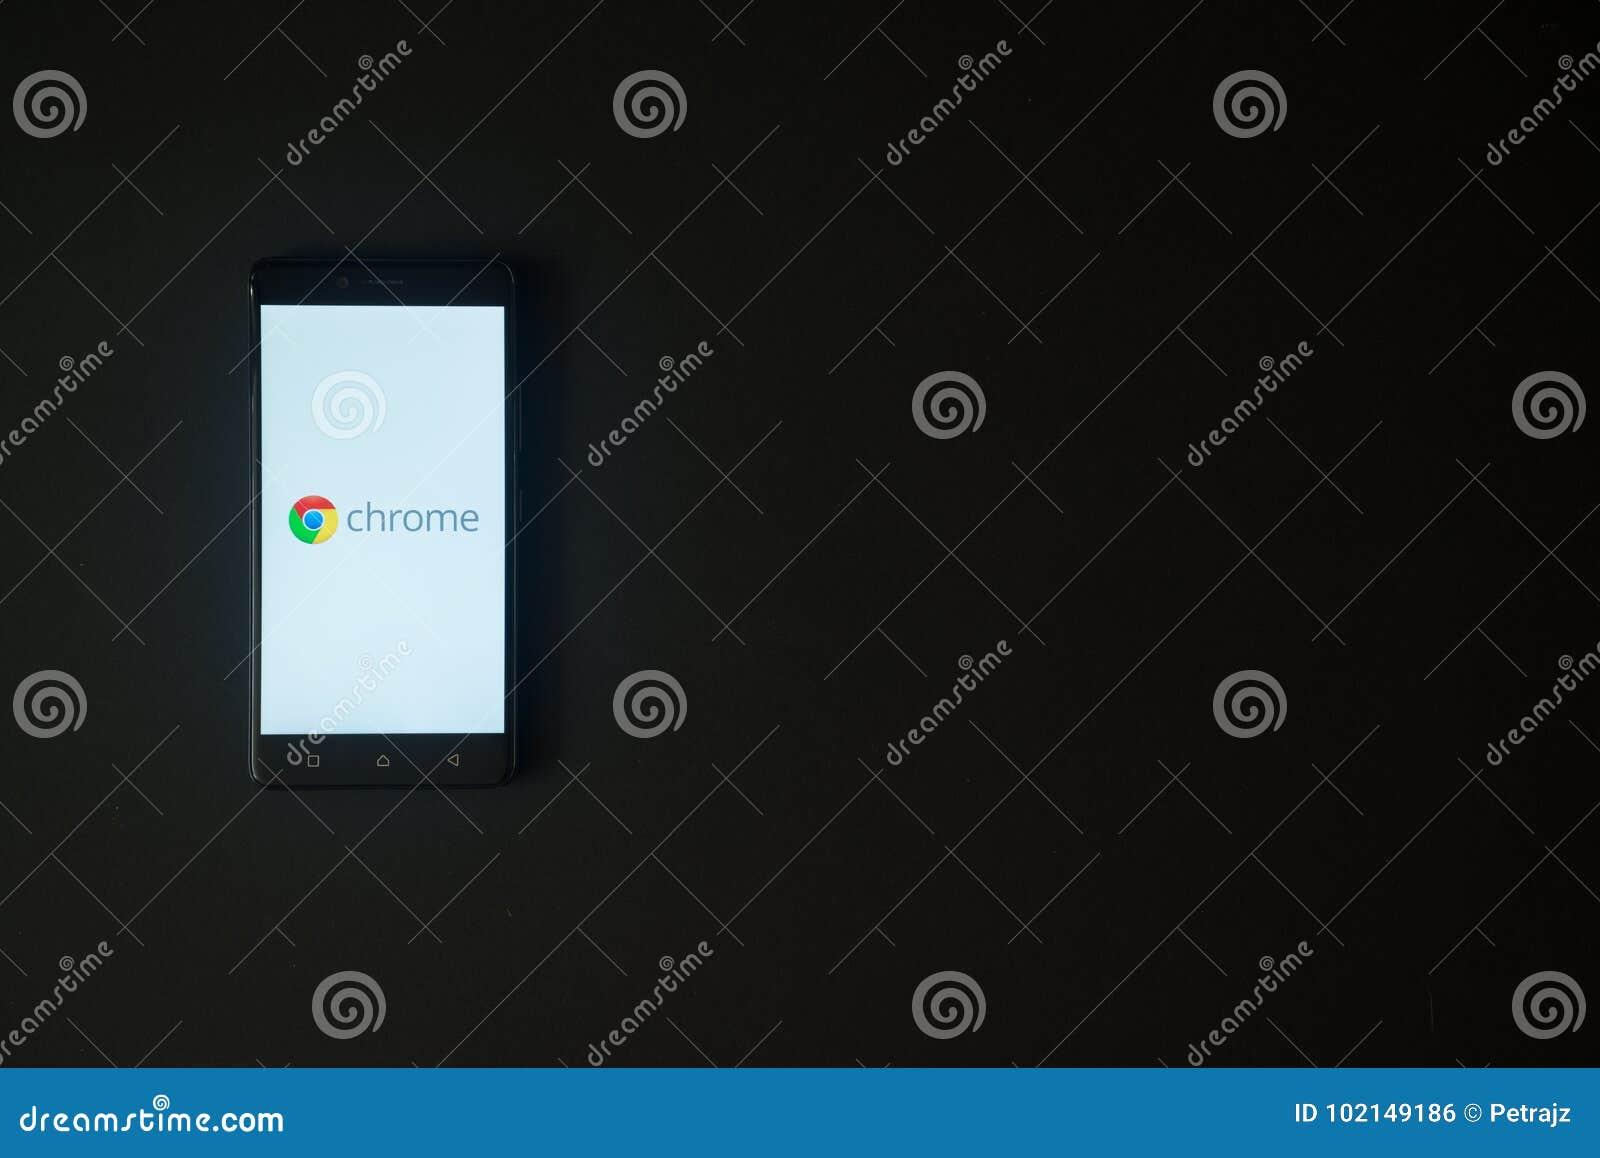 Google Chrome Logo On Smartphone Screen On Black Background